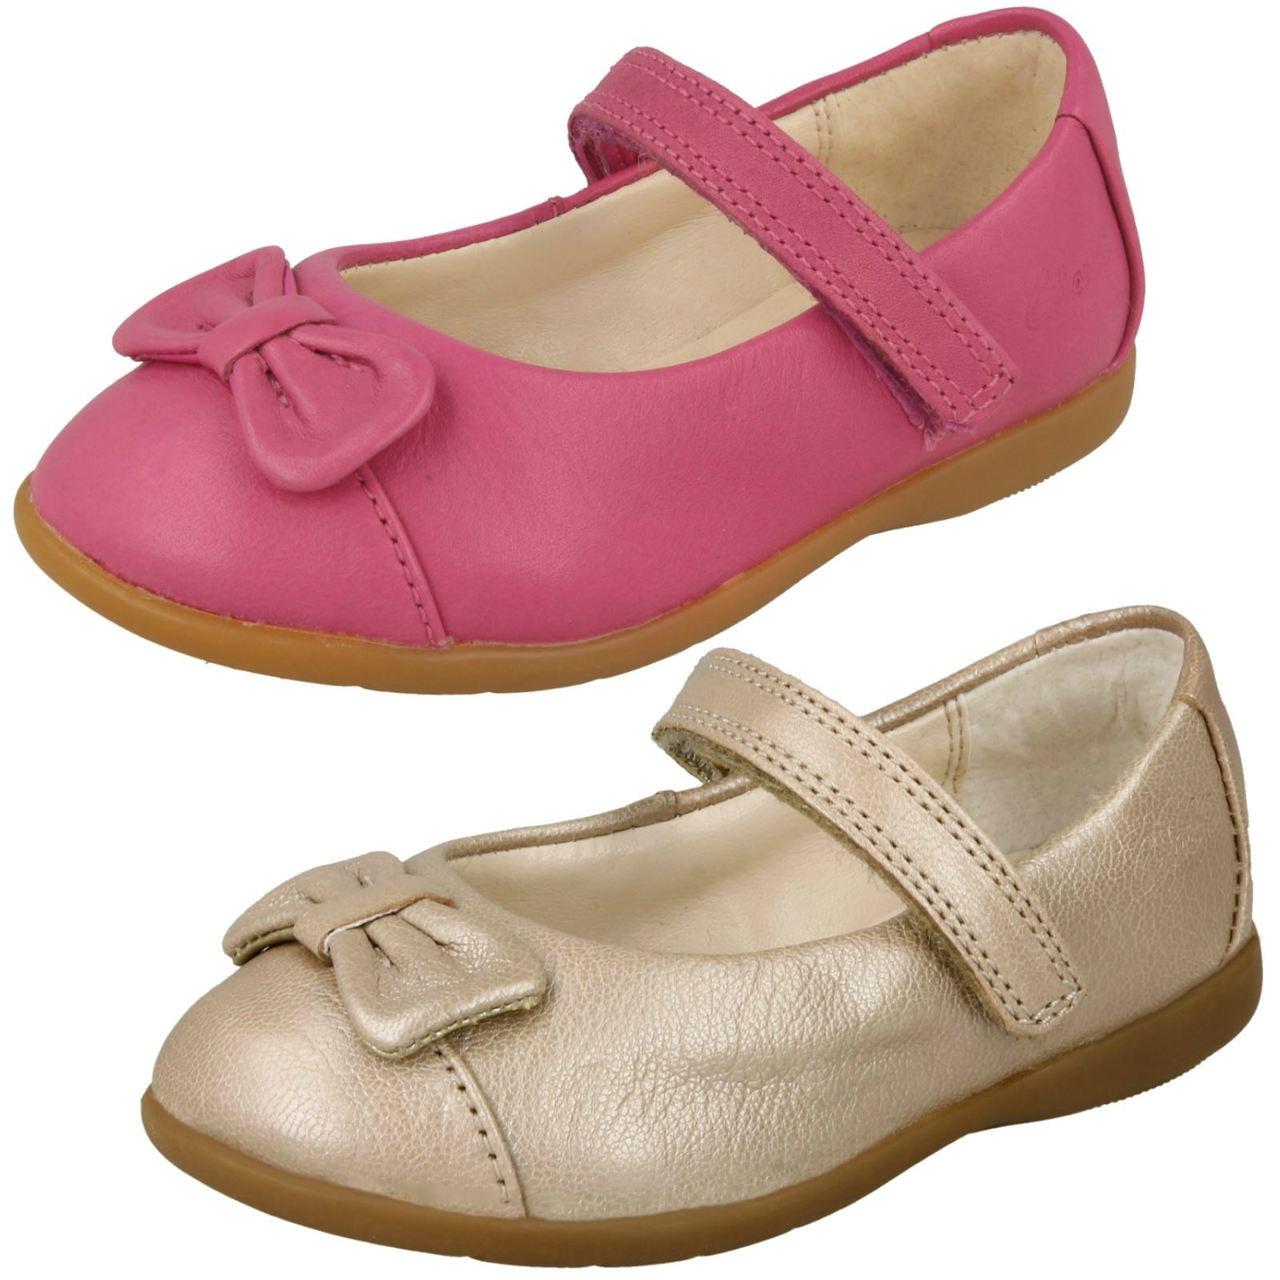 First Clarks Walking Shoes Dance Harper